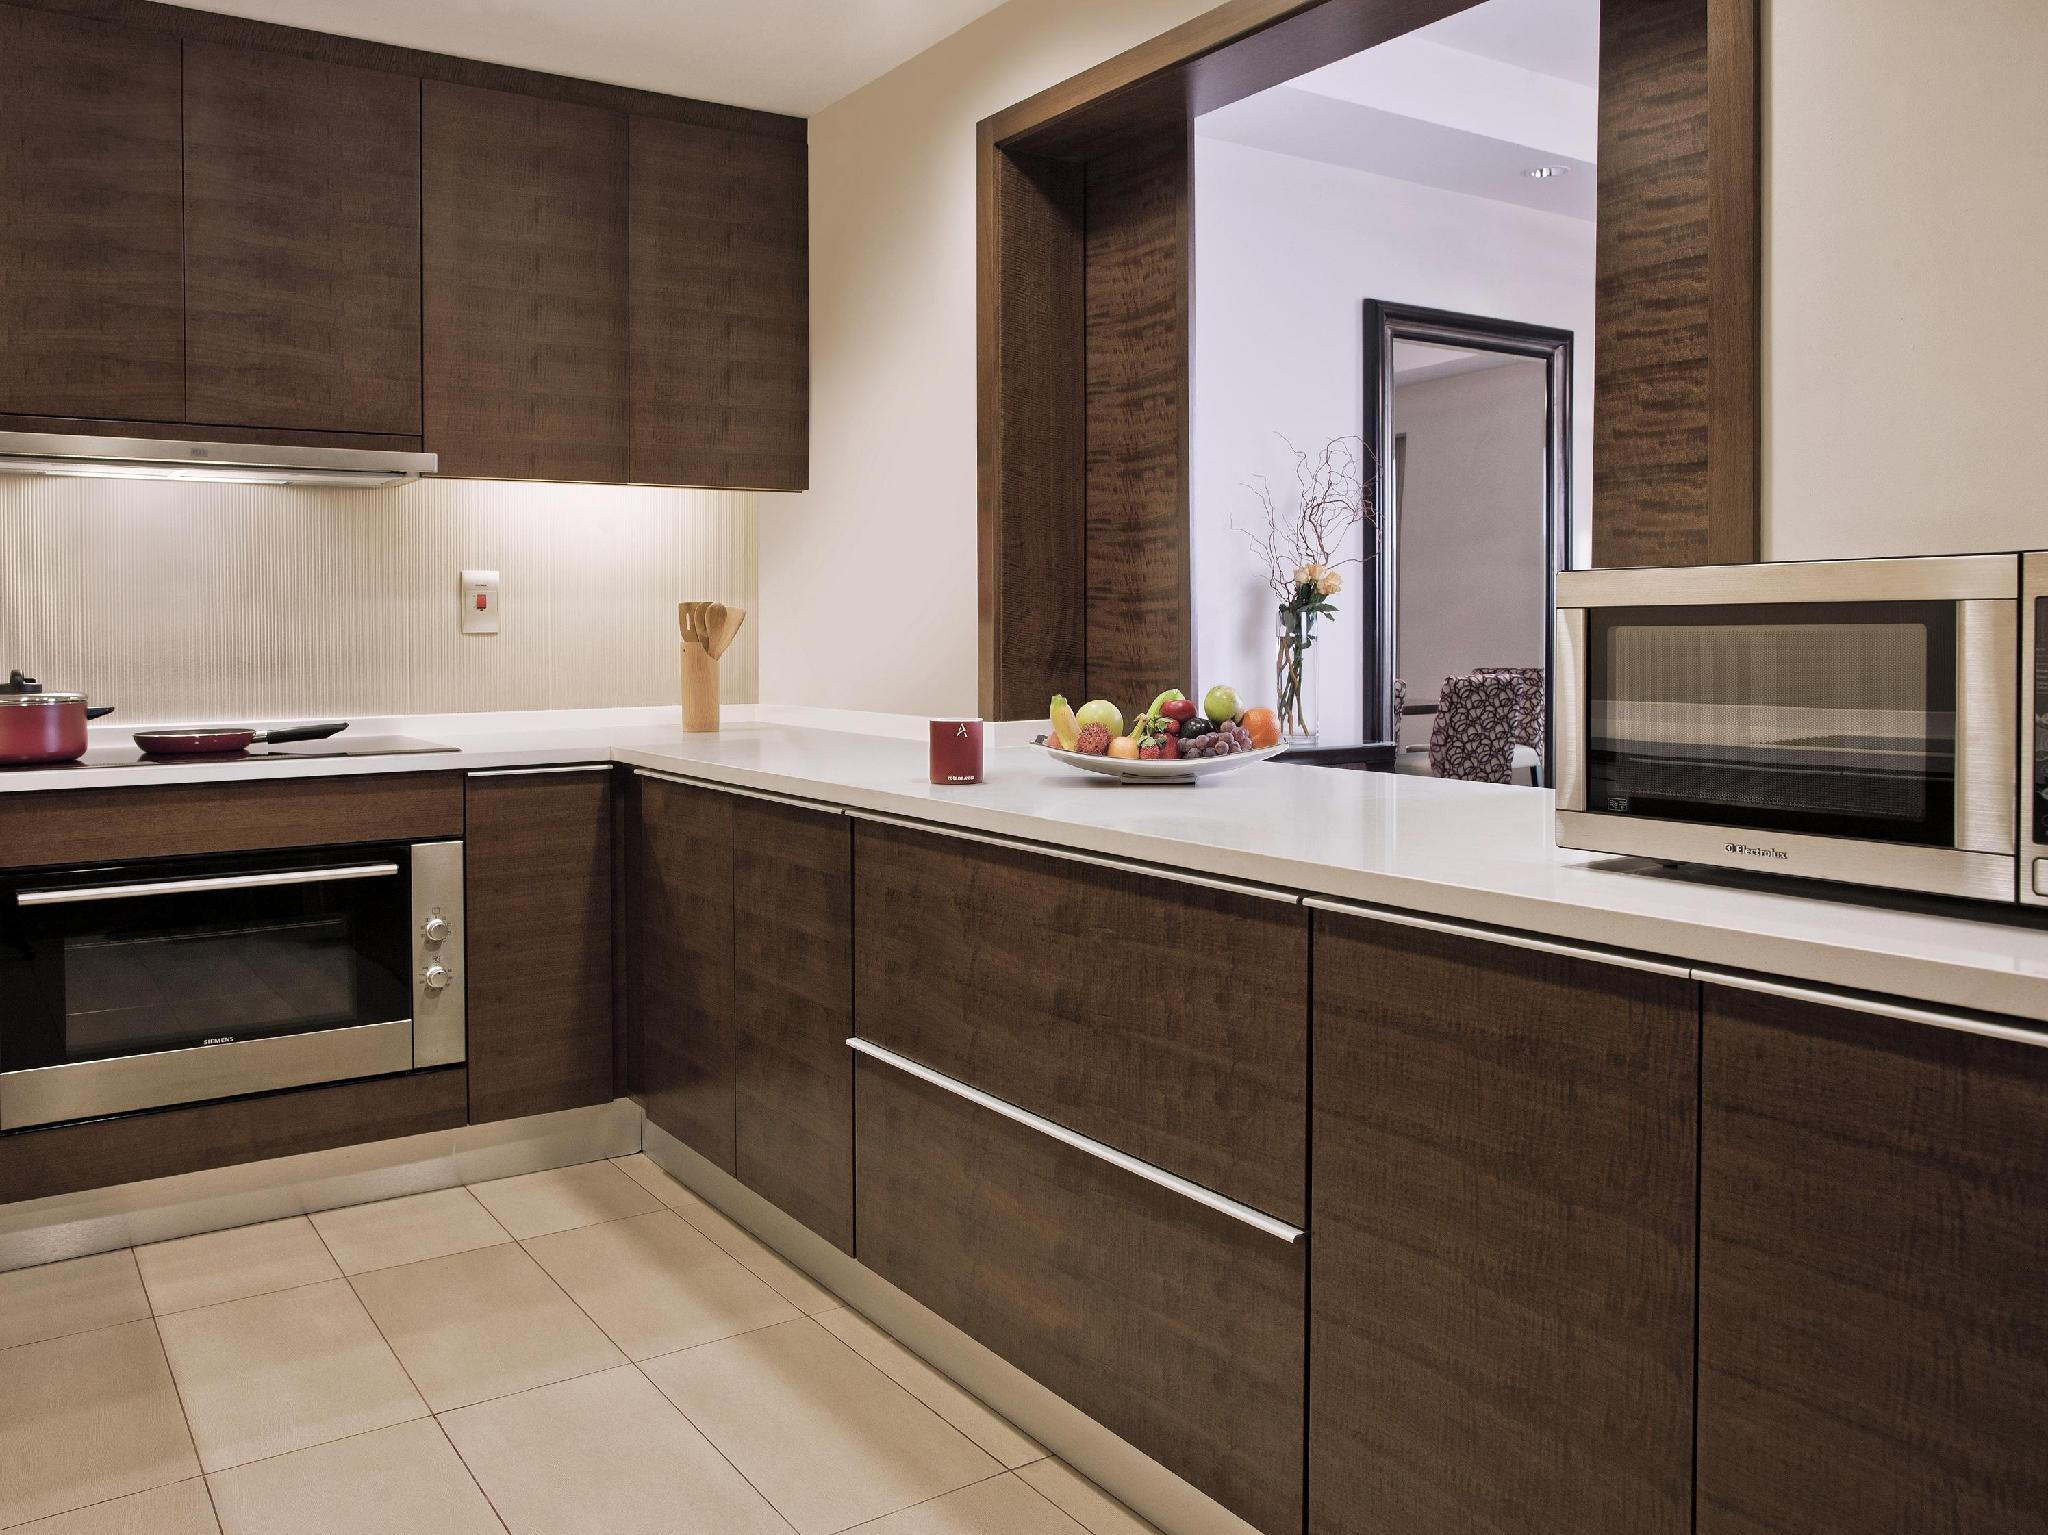 Swissotel Living Al Ghurair Dubai 3